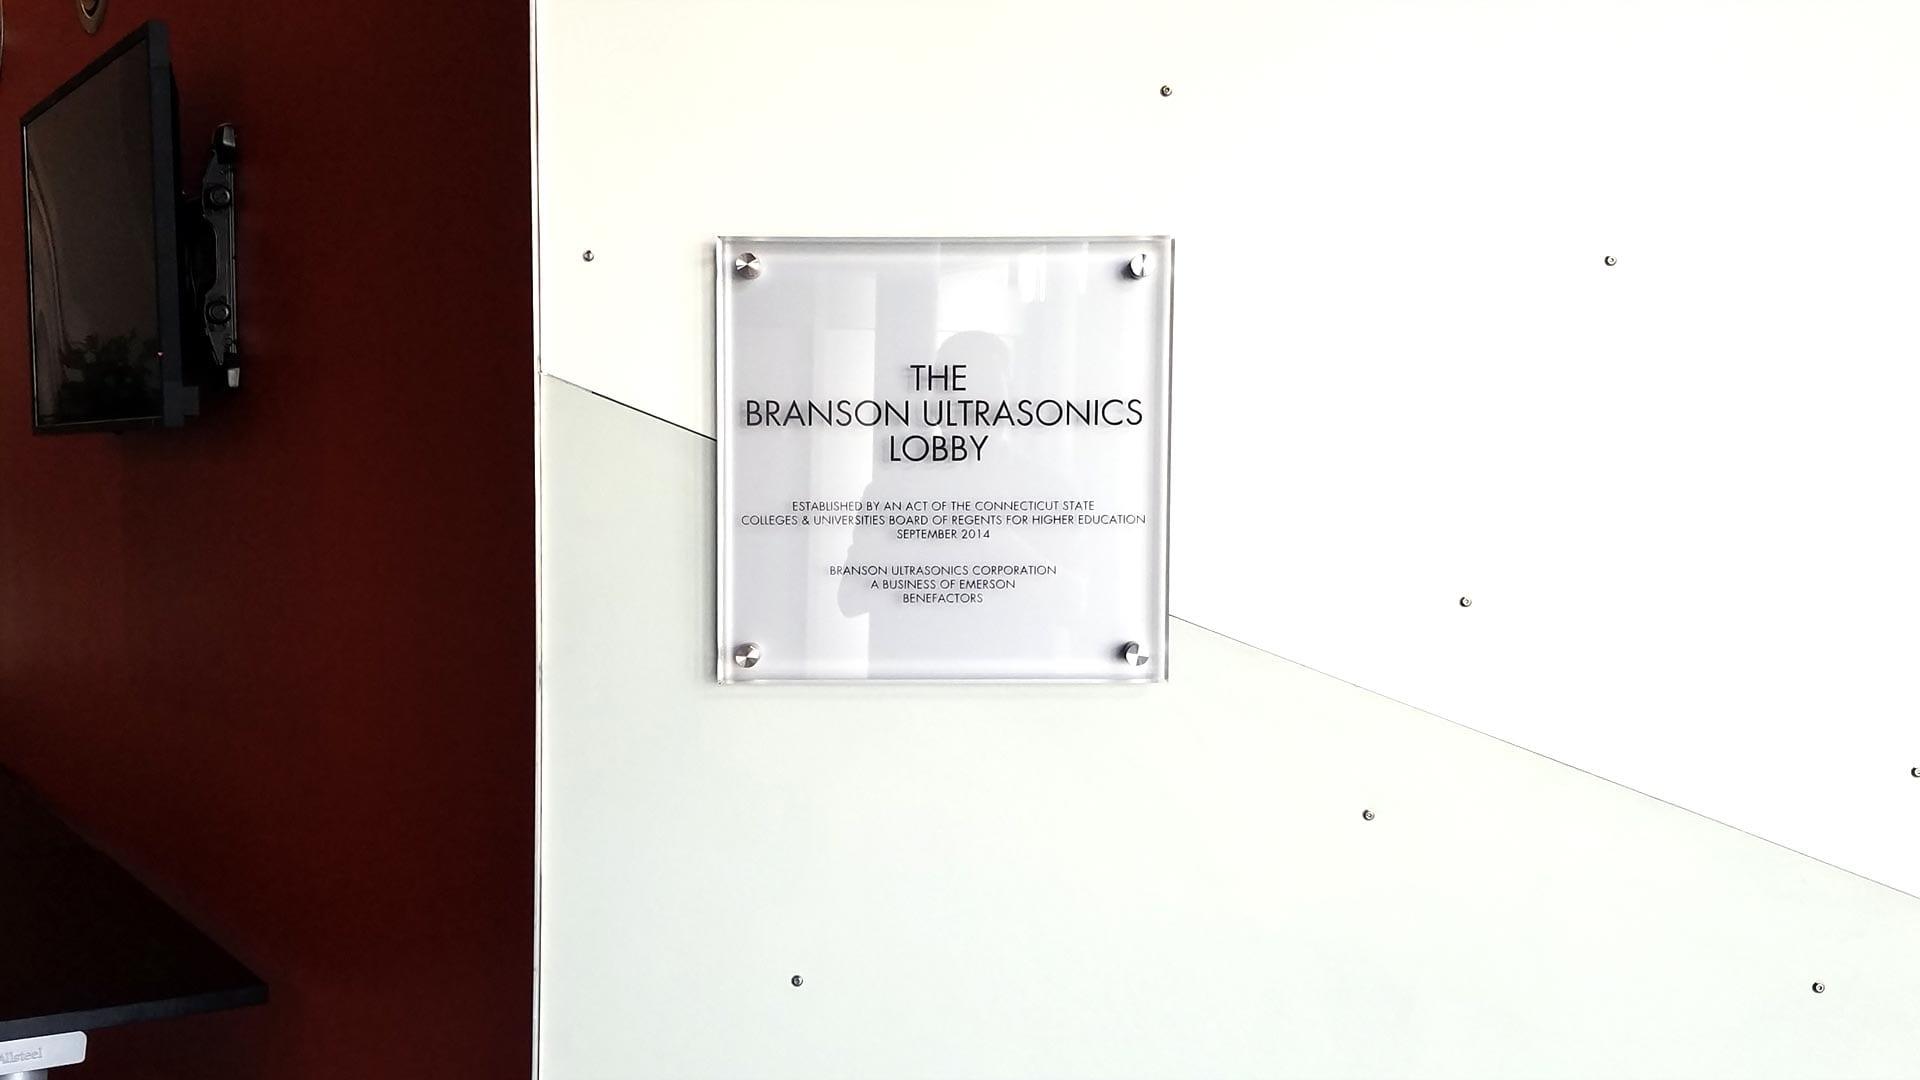 Glass Plaque for Branson Ultrasonics Lobby